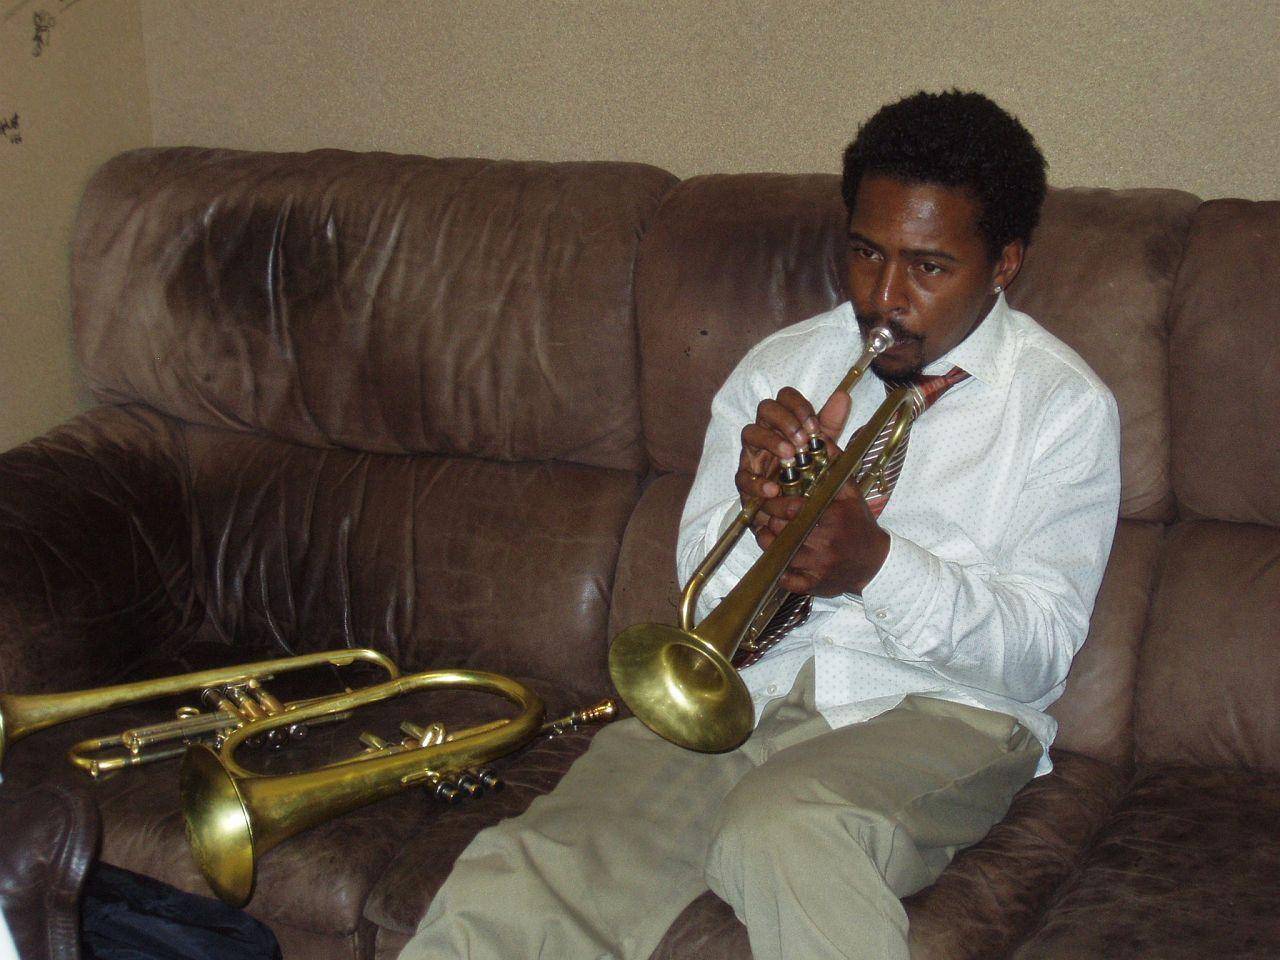 Musiker 291